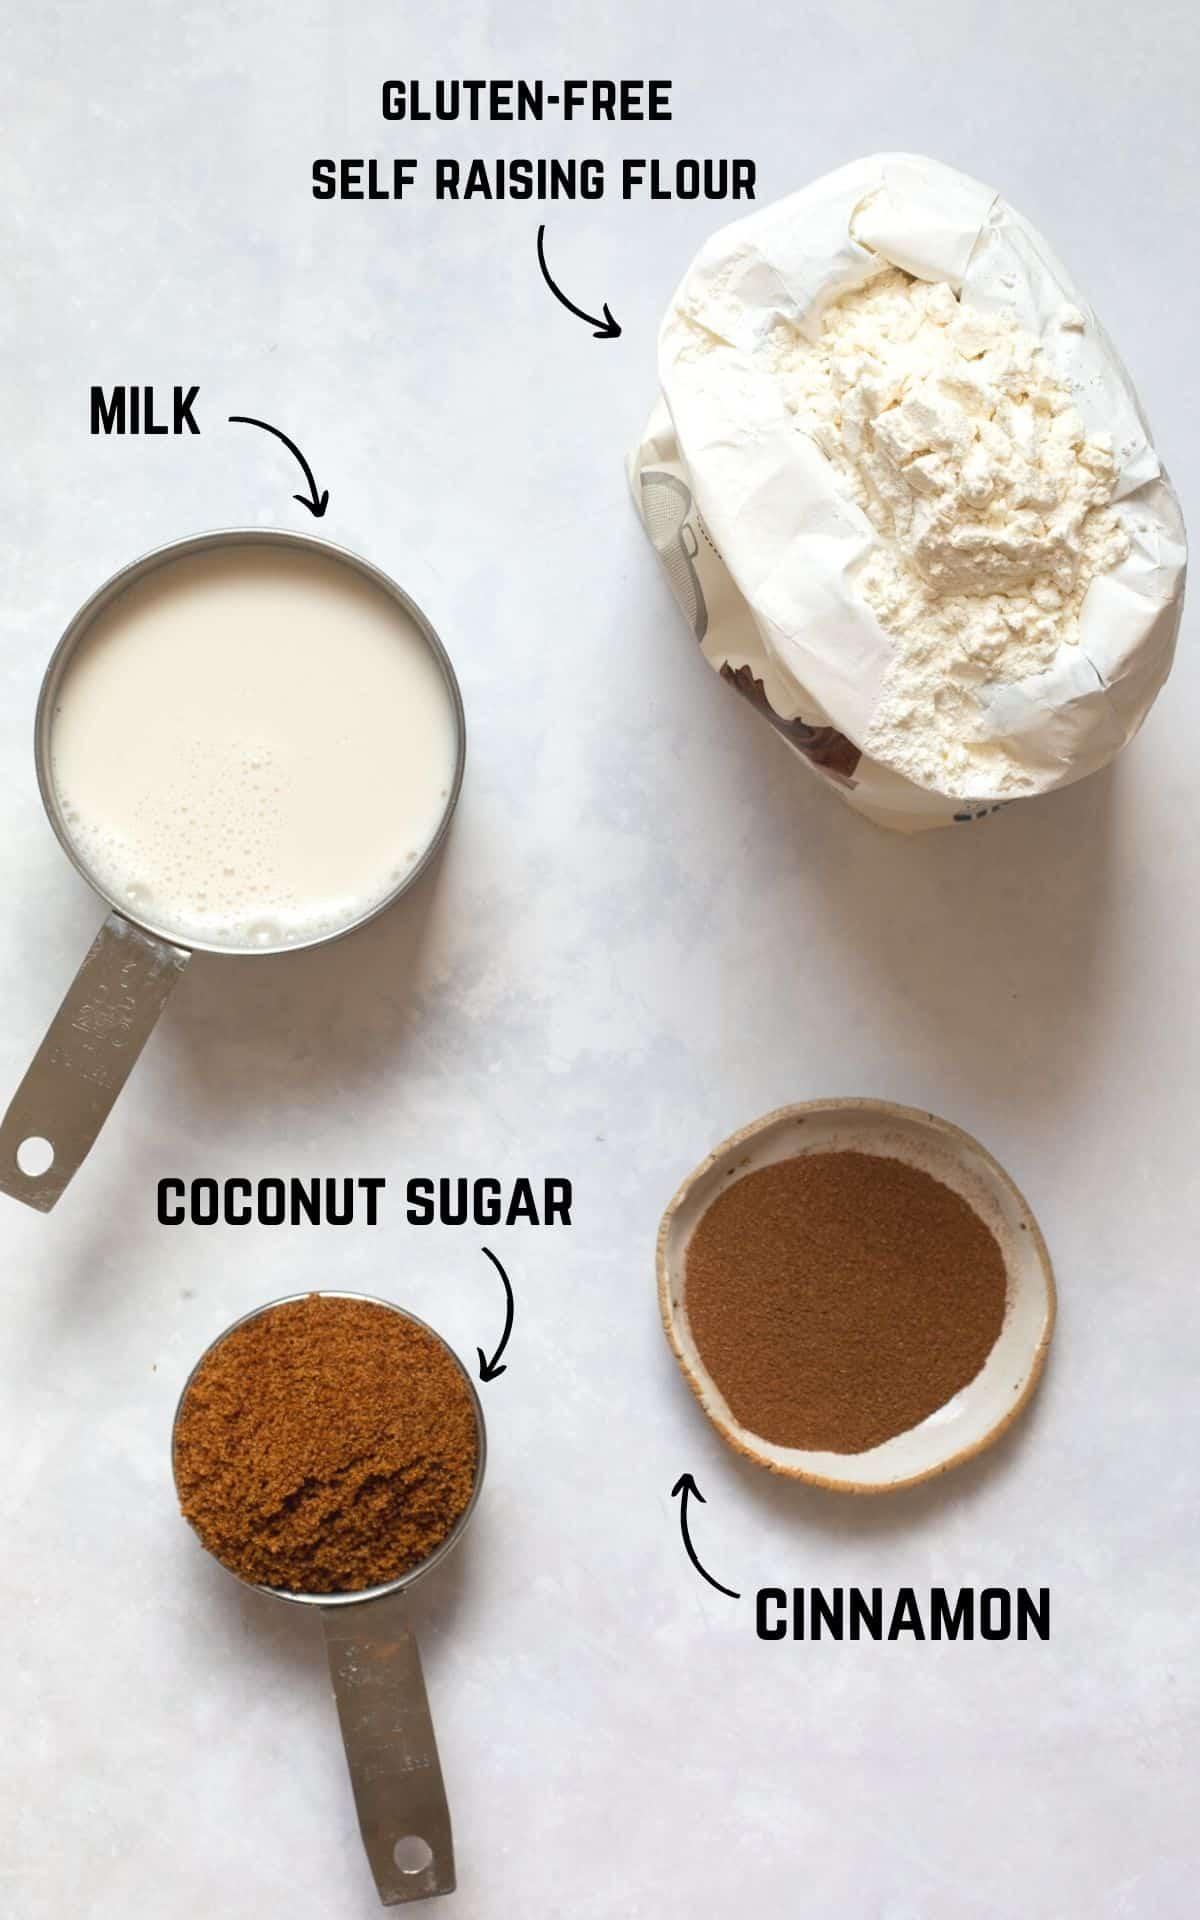 labelled 4 ingredients. Cinnamon, coconut sugar, milk and flour